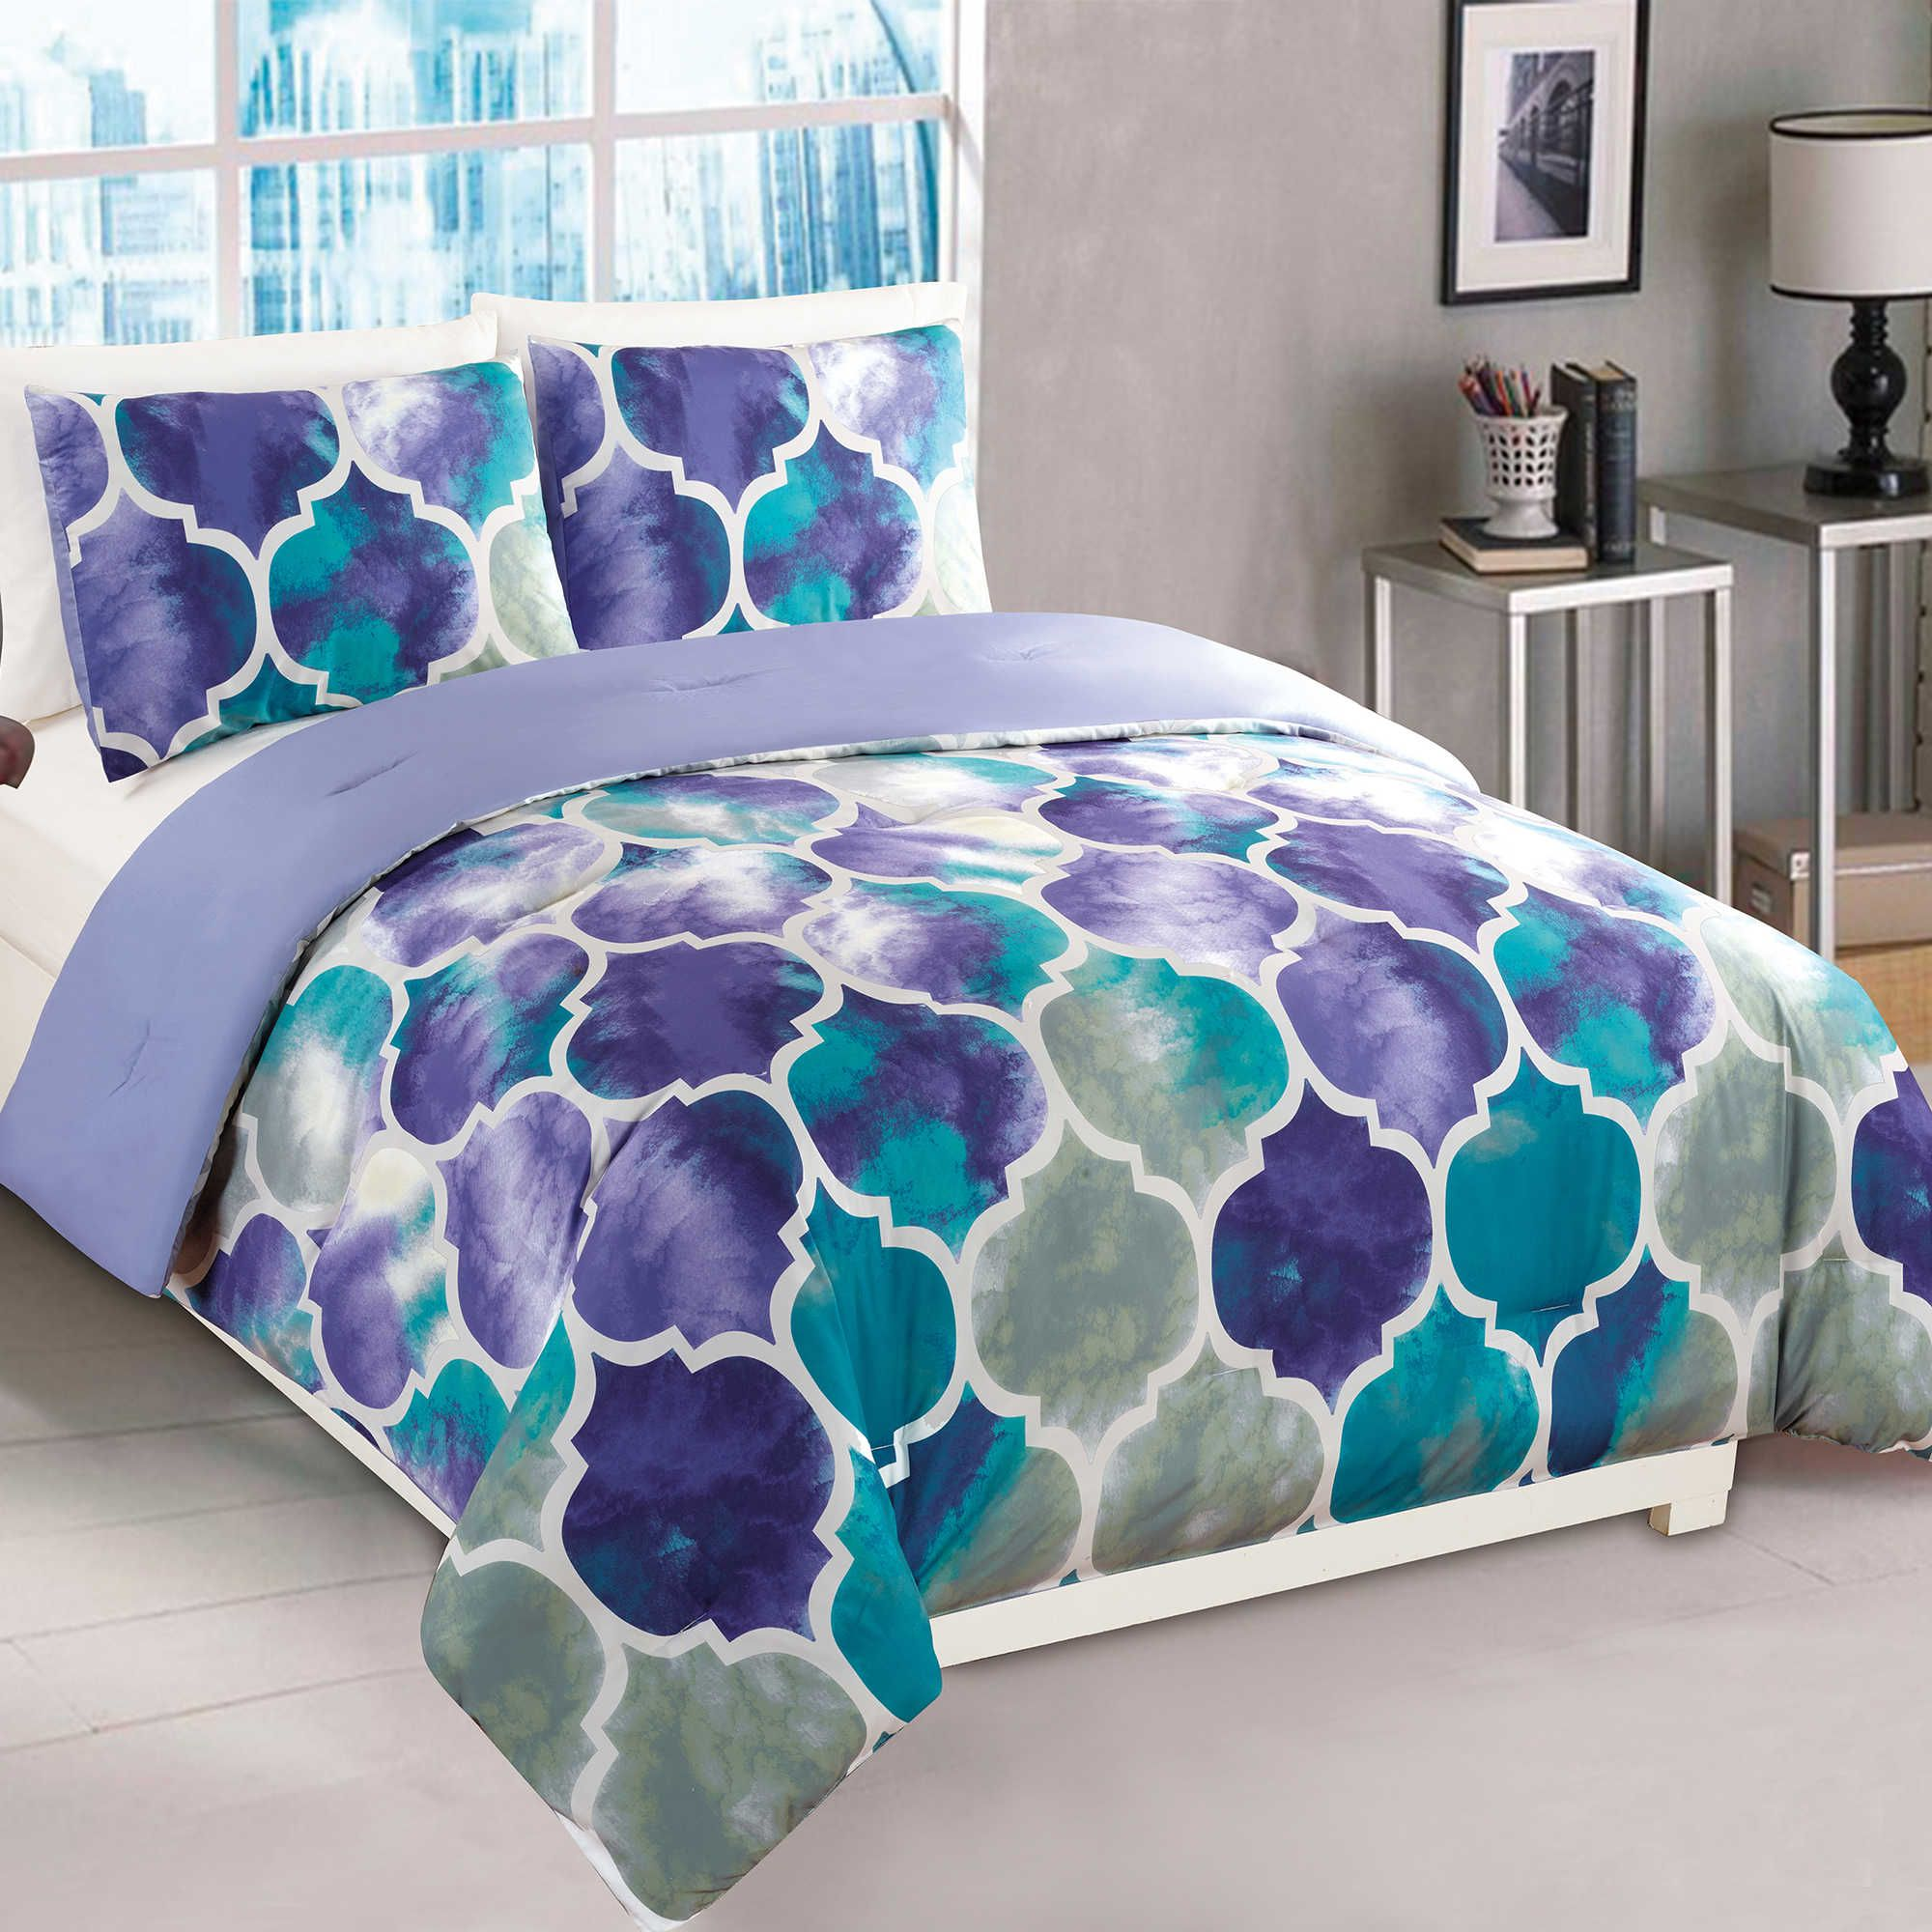 Emmi 2 Piece Twin Comforter Set In Purple Teal Bed Bath Beyond